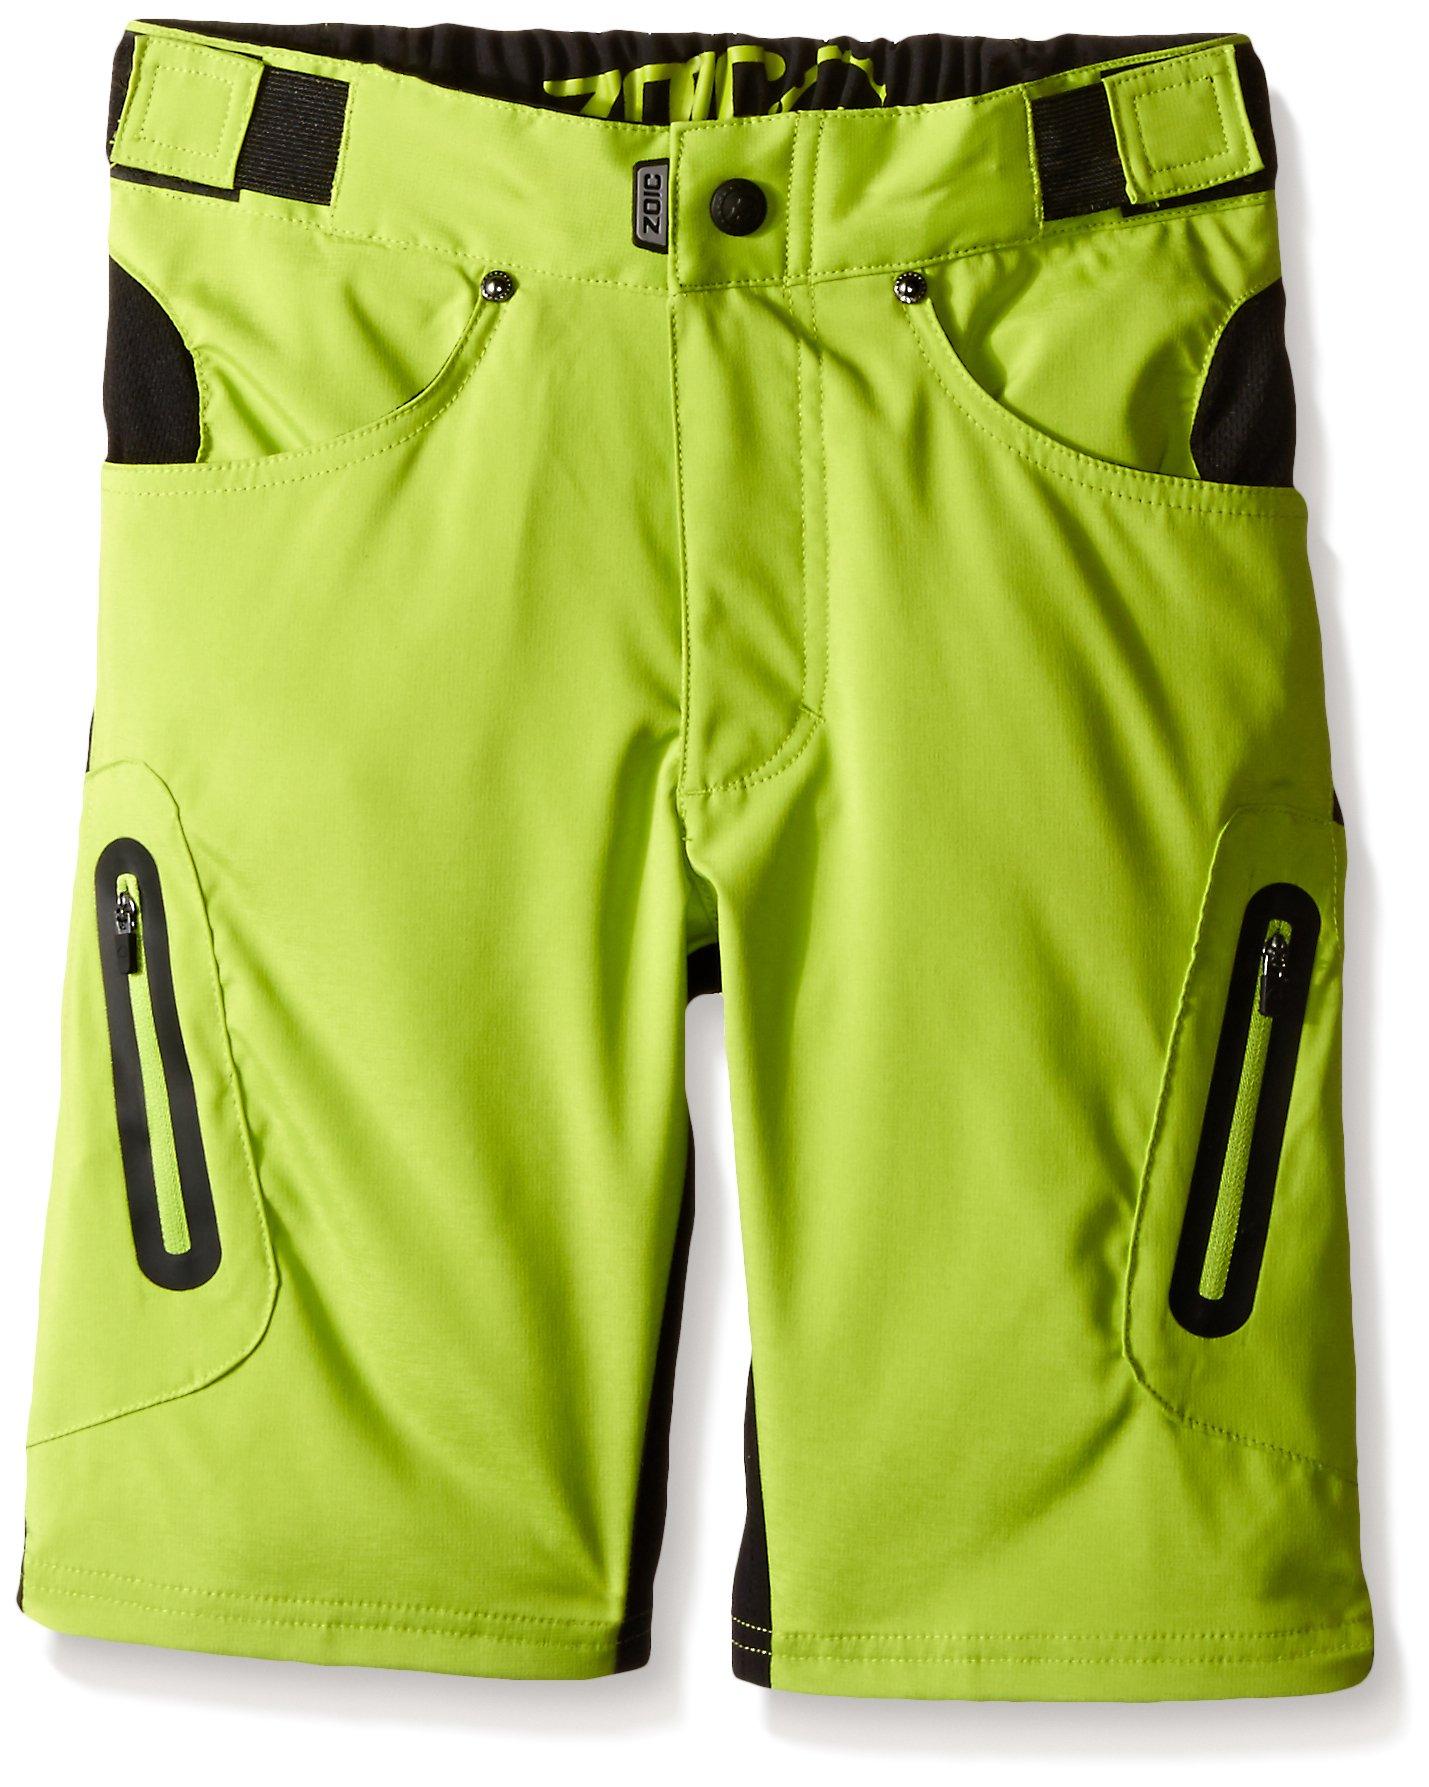 ZOIC Boy's Ether Jr. Shorts, Atomic, Large